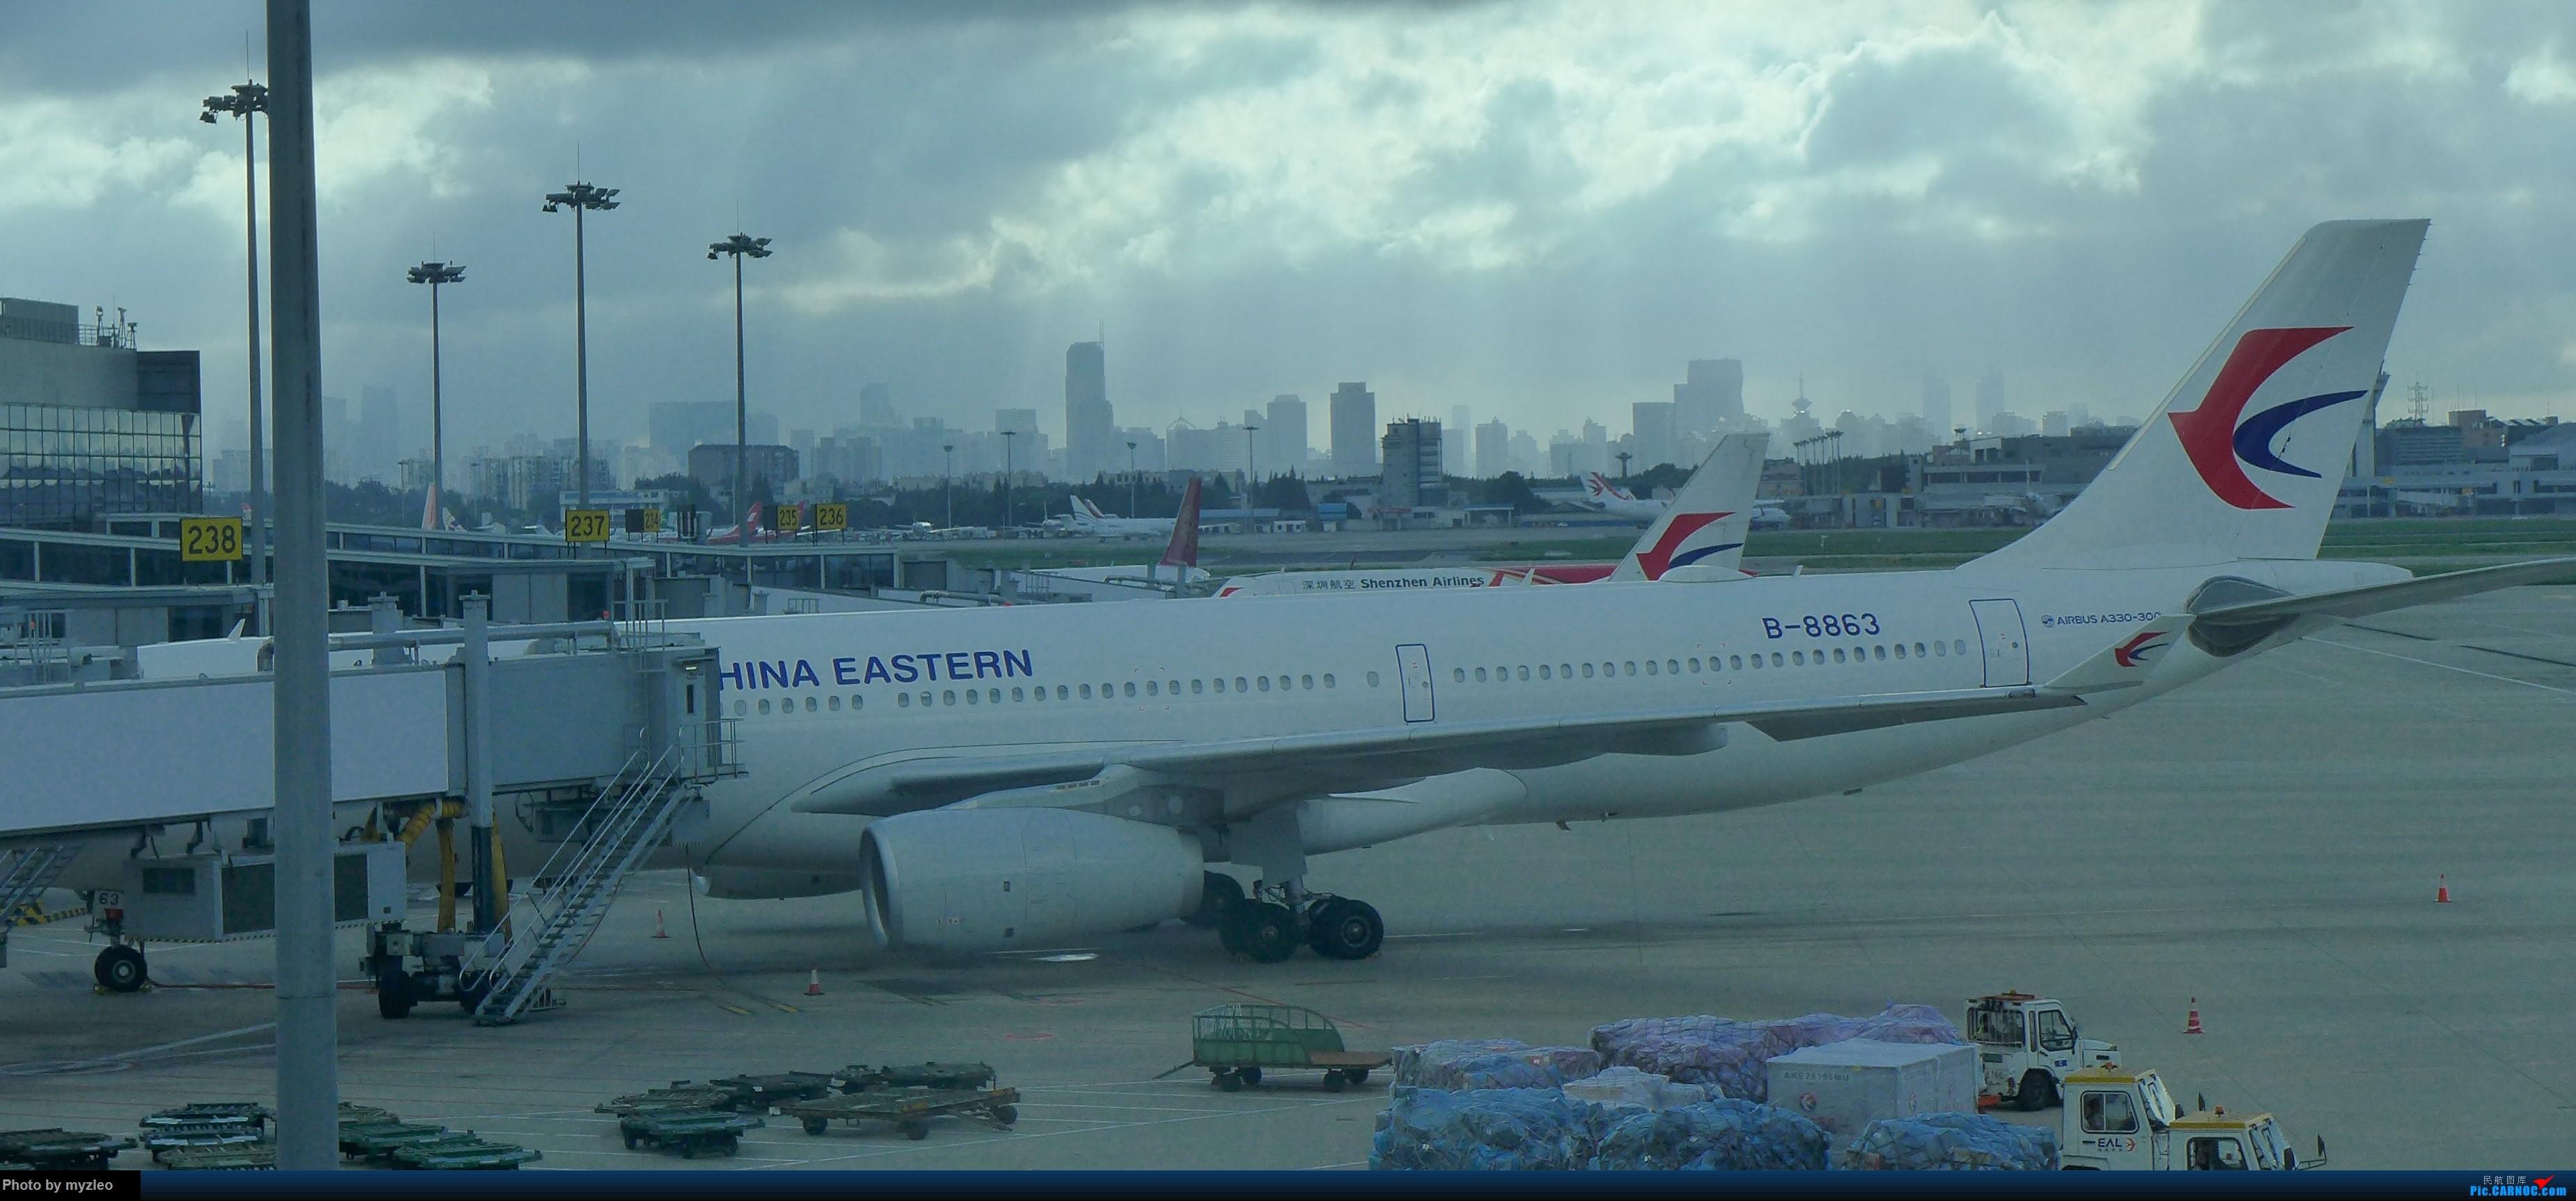 Re:[原创]【myzleo的游记3.1】三访帝都——记一次意外的惊喜,大鹅头初遇,第一次去中关村 AIRBUS A330-300 B-8863 中国上海虹桥国际机场